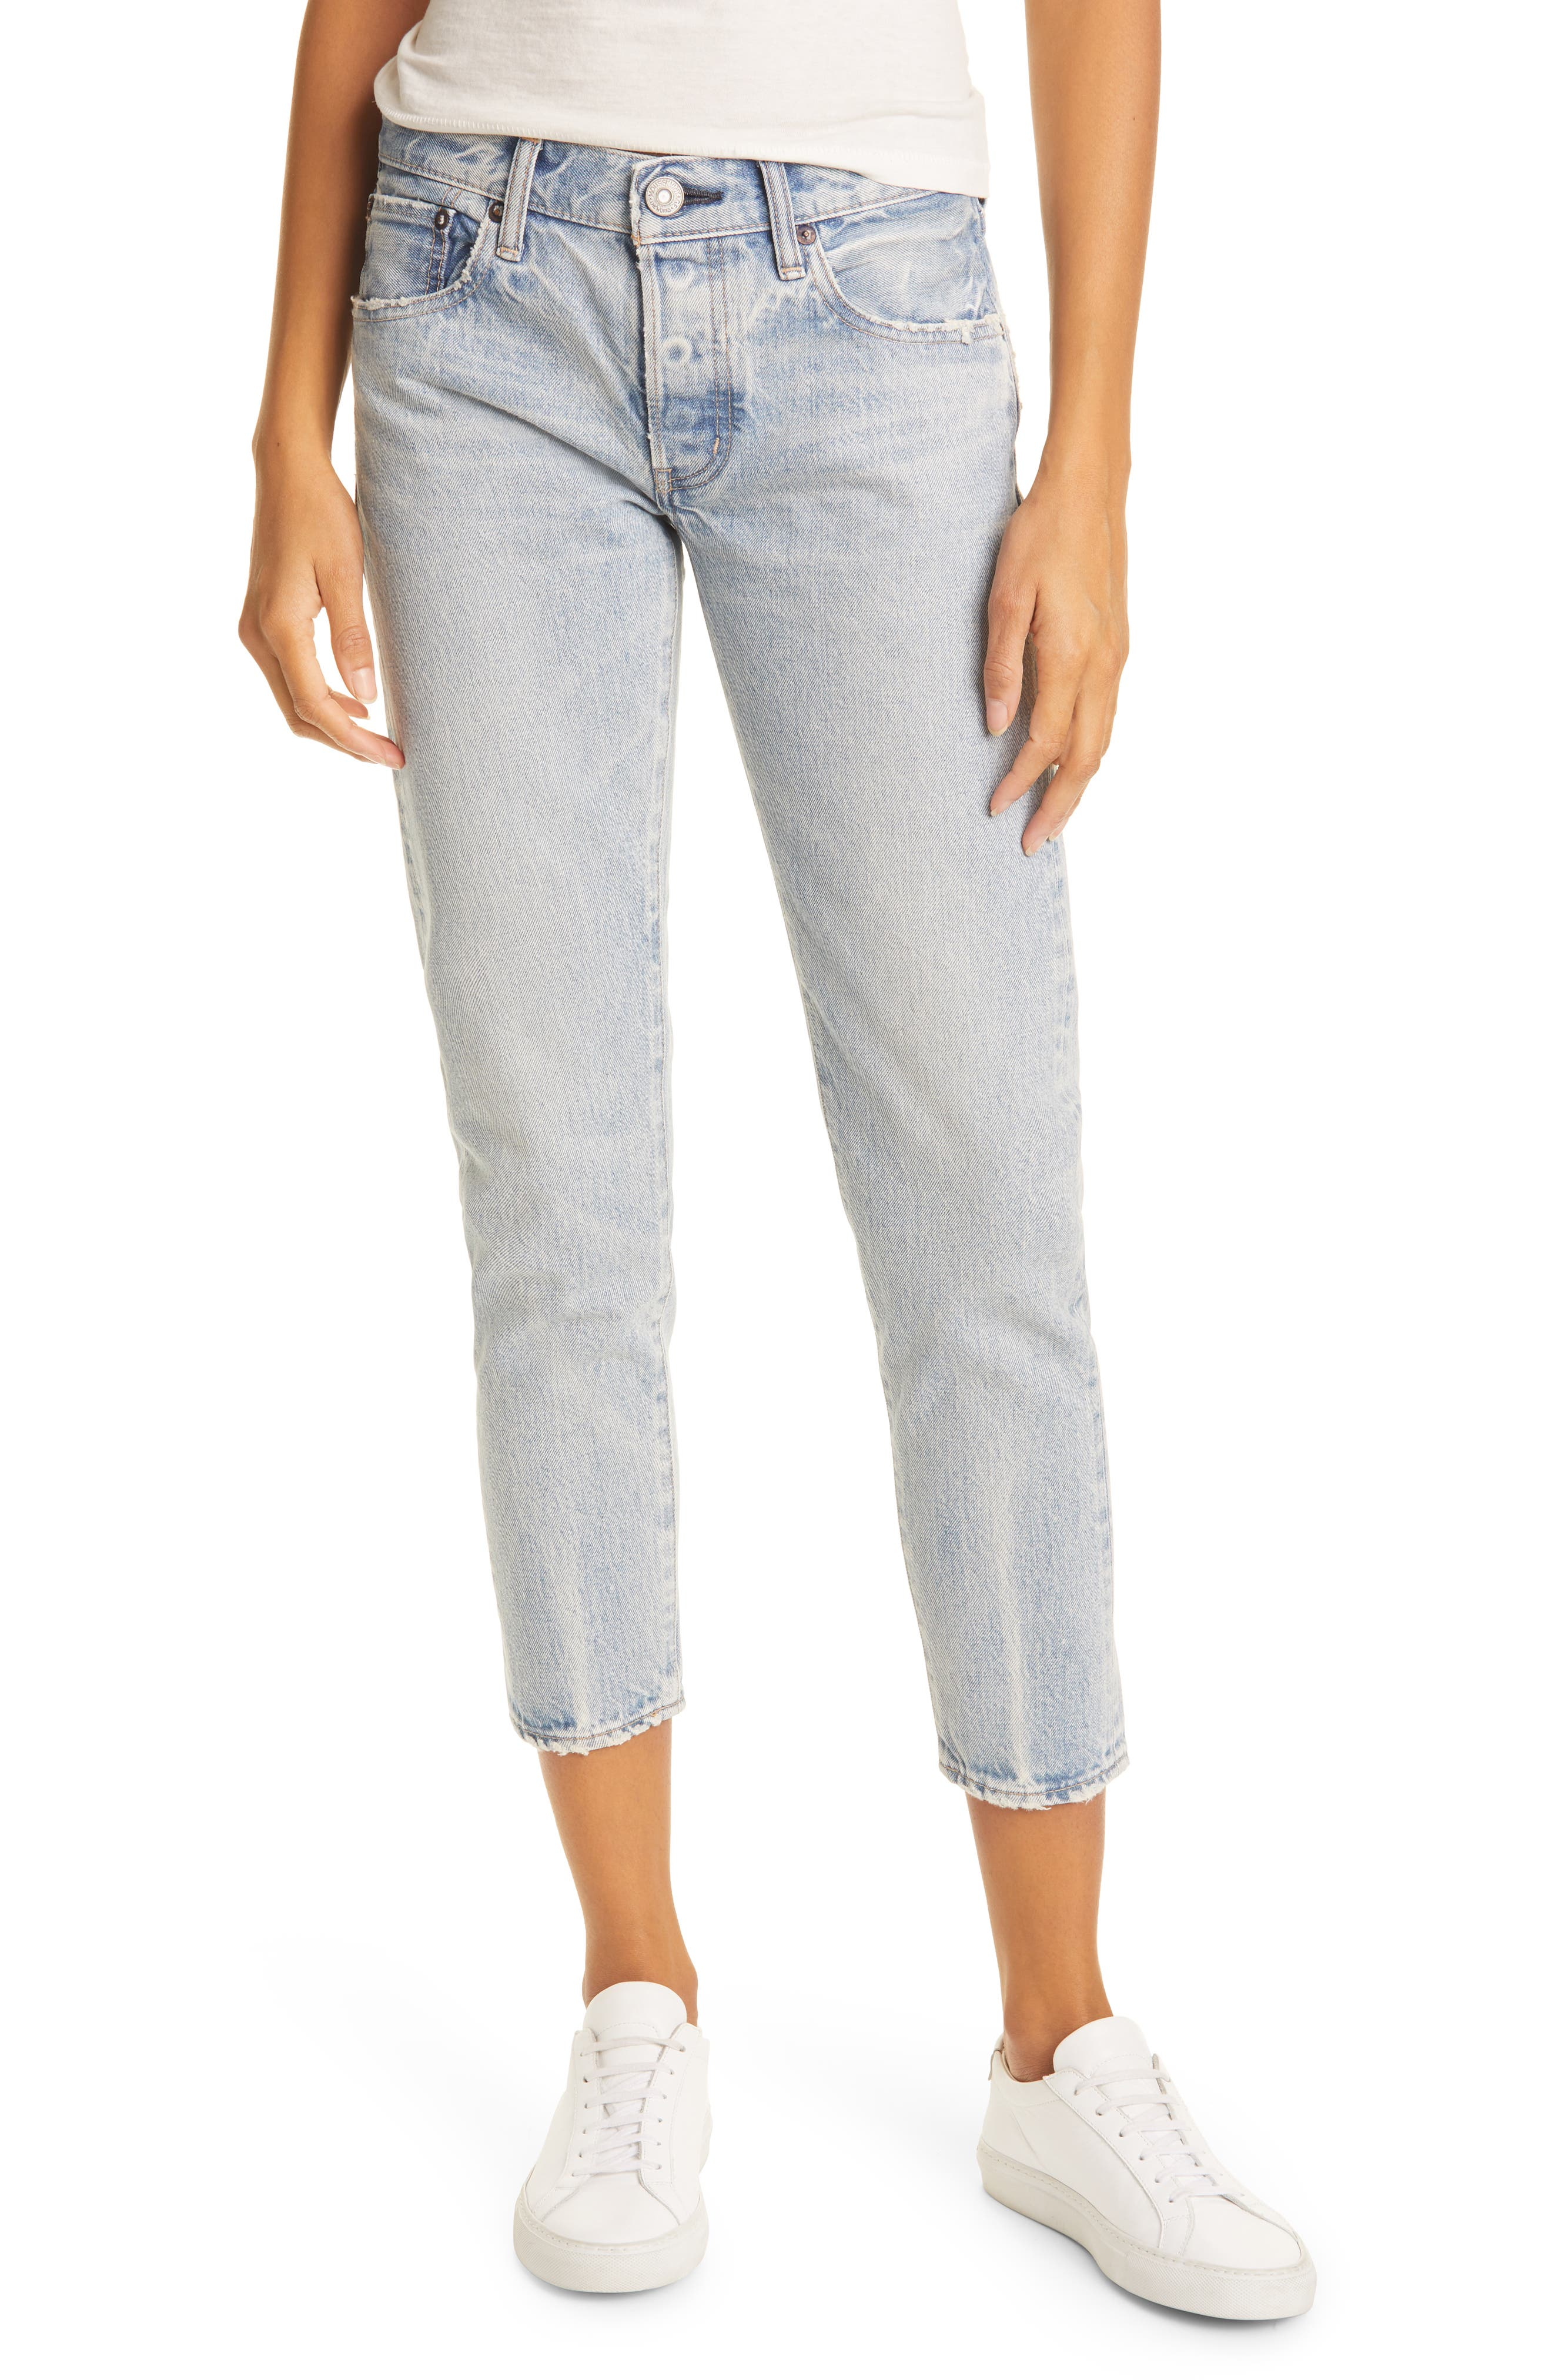 Cedar Rapids Tapered Skinny Jeans